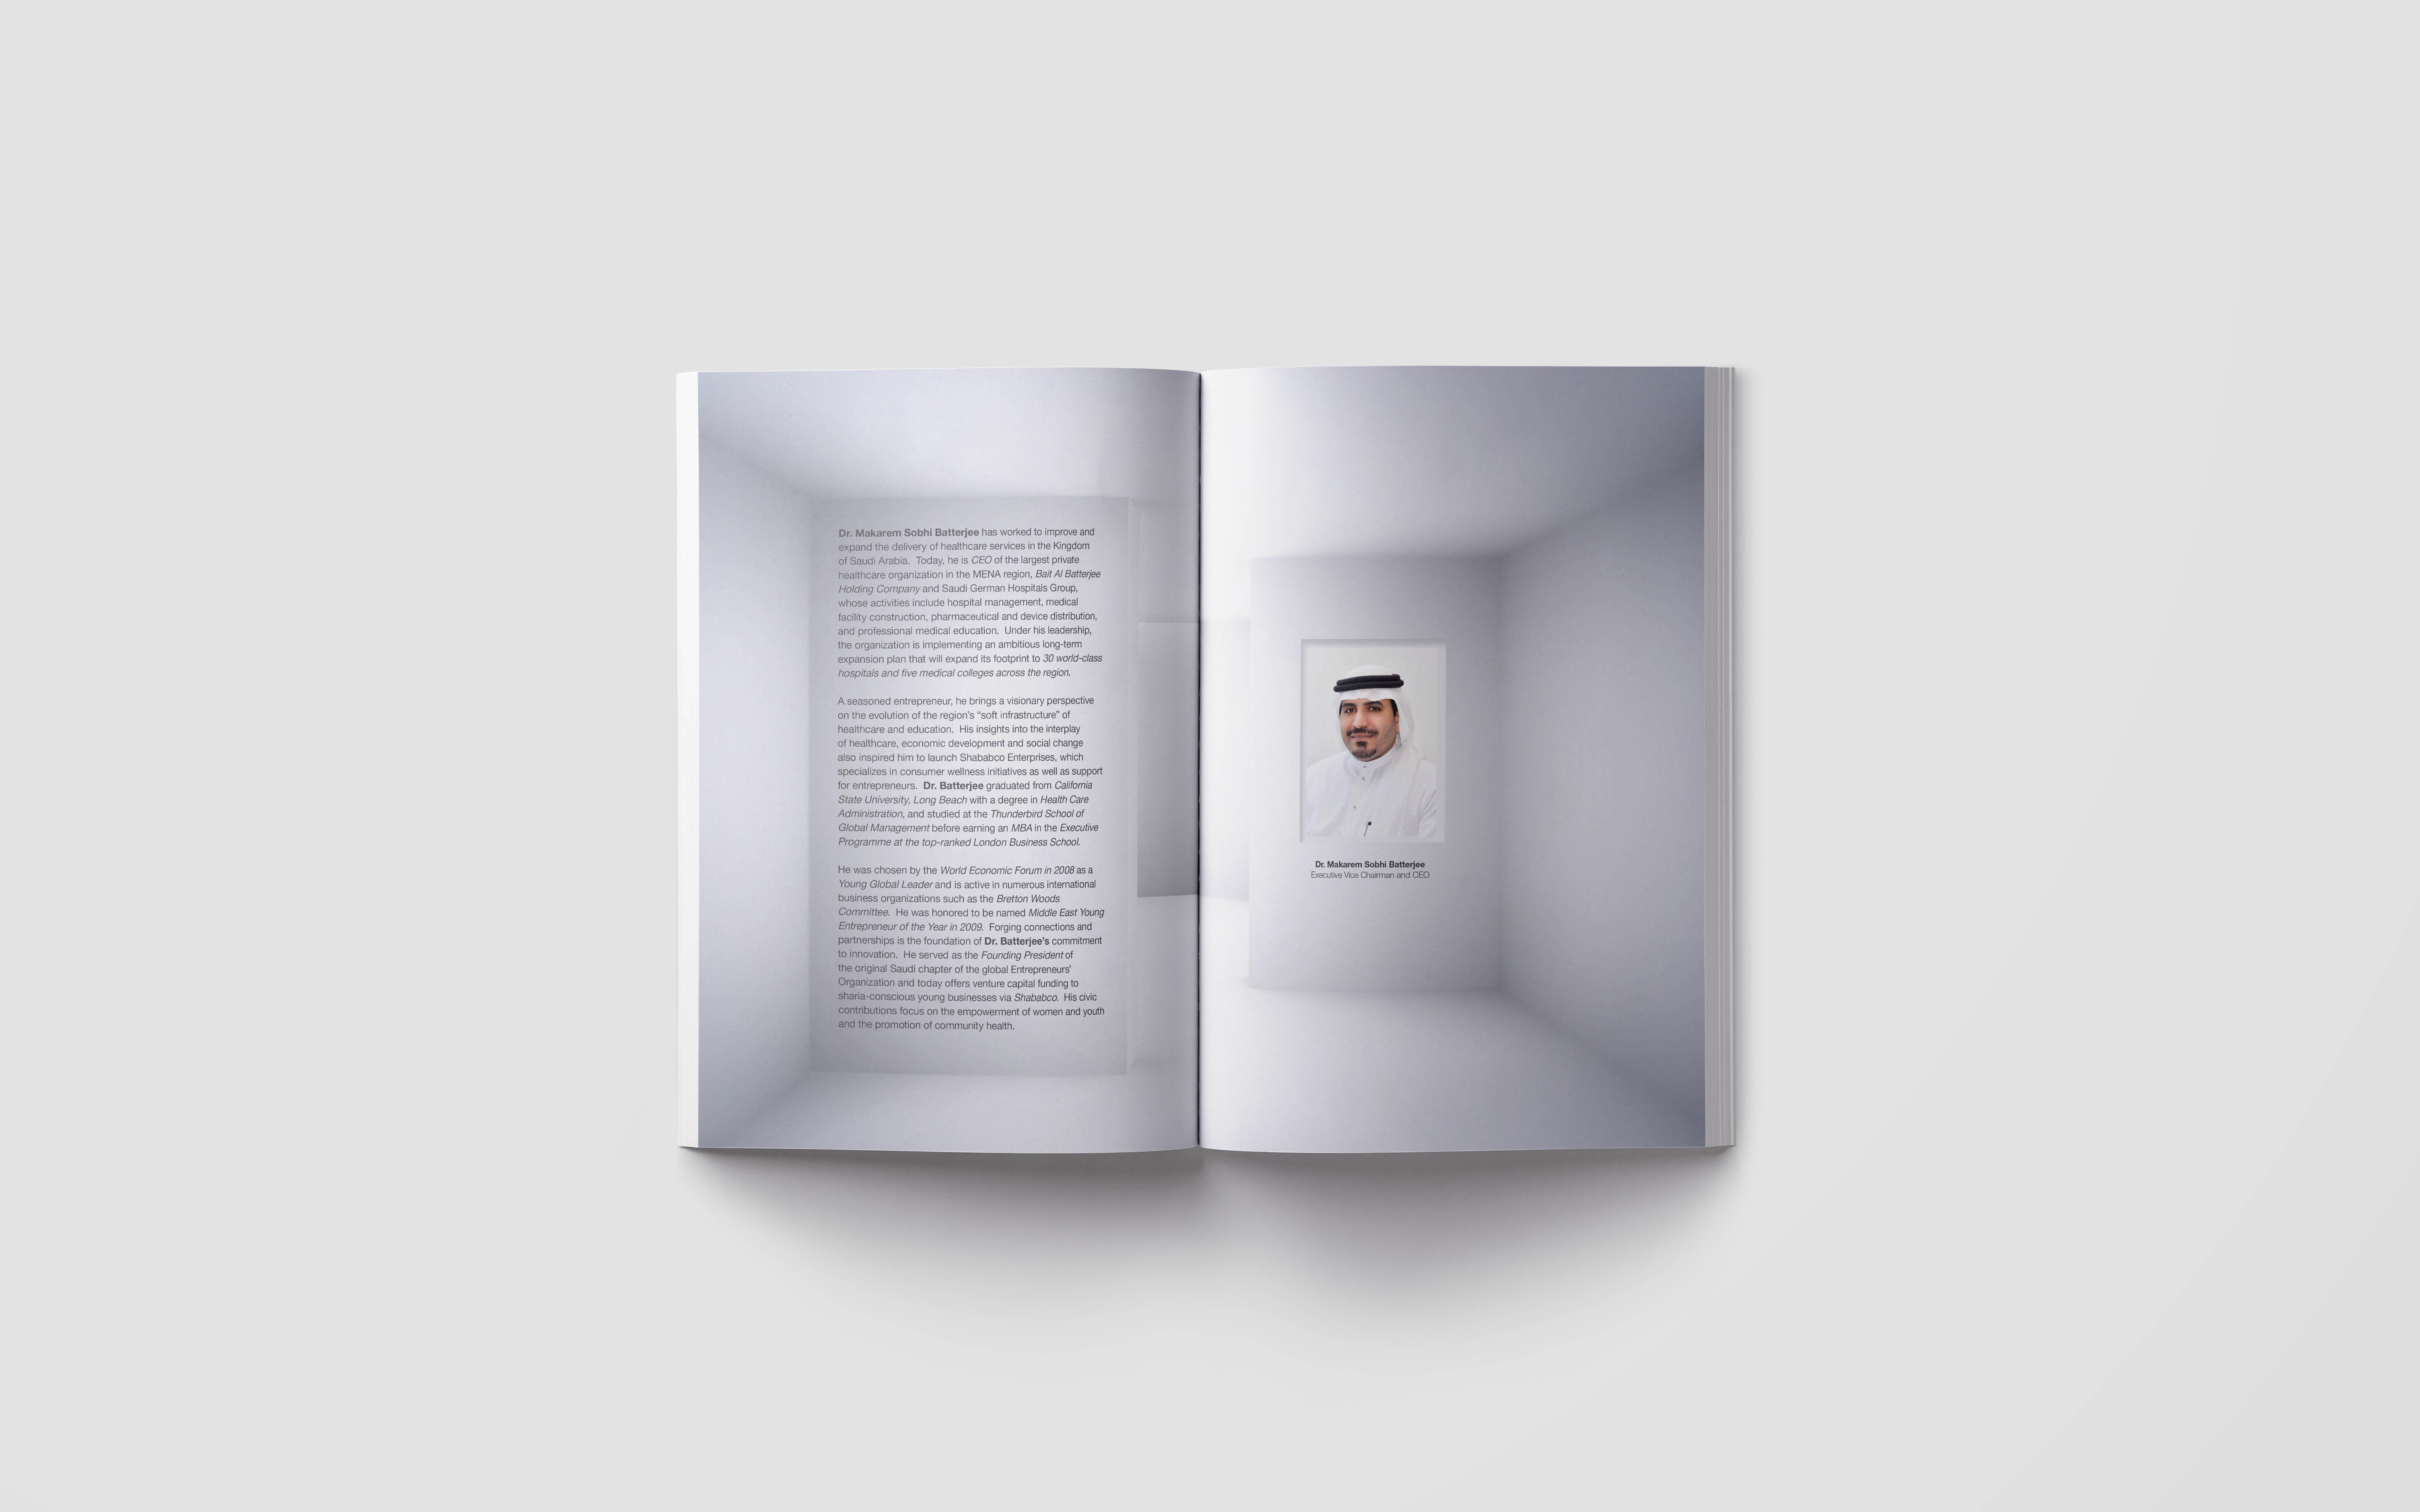 006_AlBatarjee_Corporate Profile